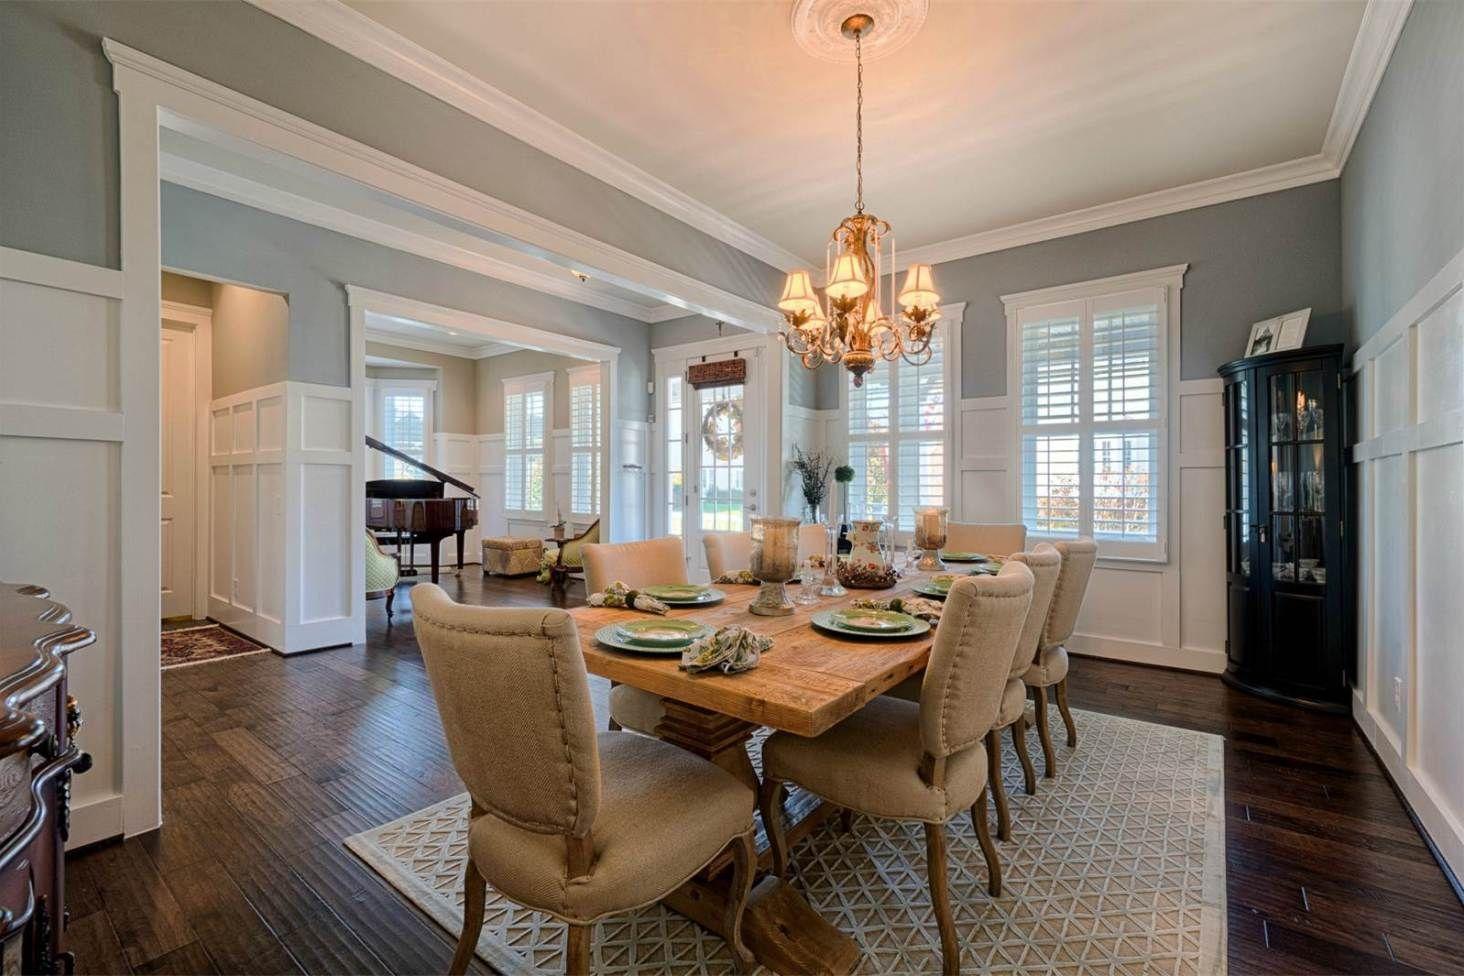 Stunning Craftsman Style Home Tour - #craftsmanstylehomes